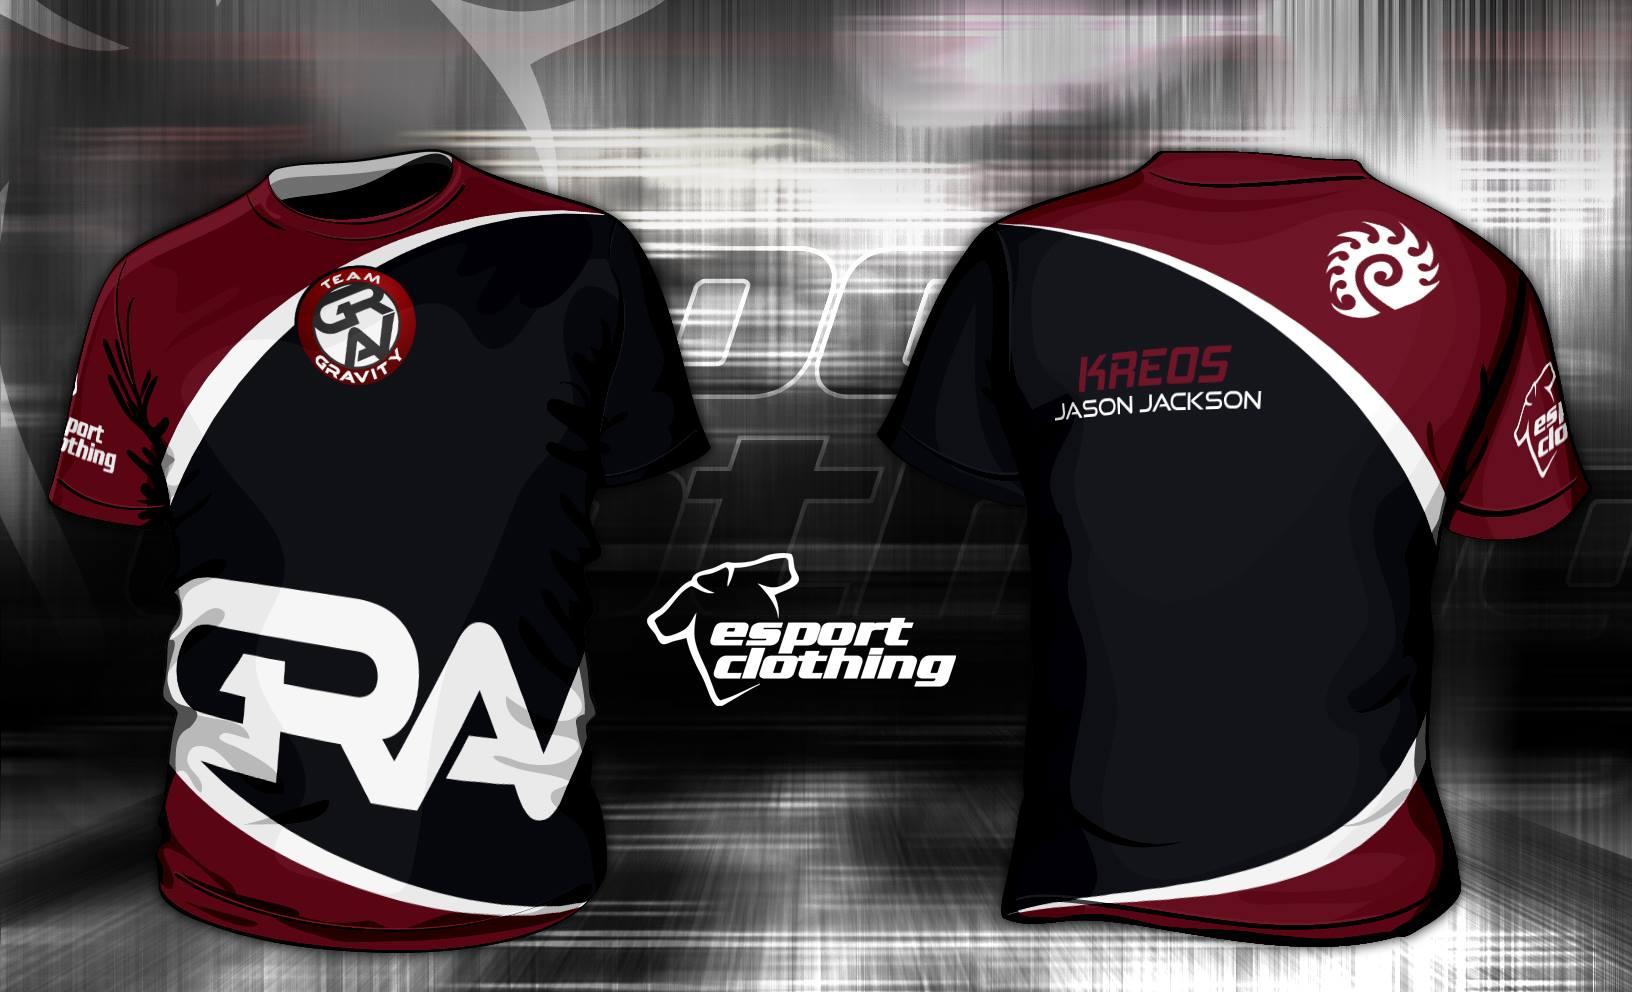 Team Gravity - Athlete Short Sleeve Jersey